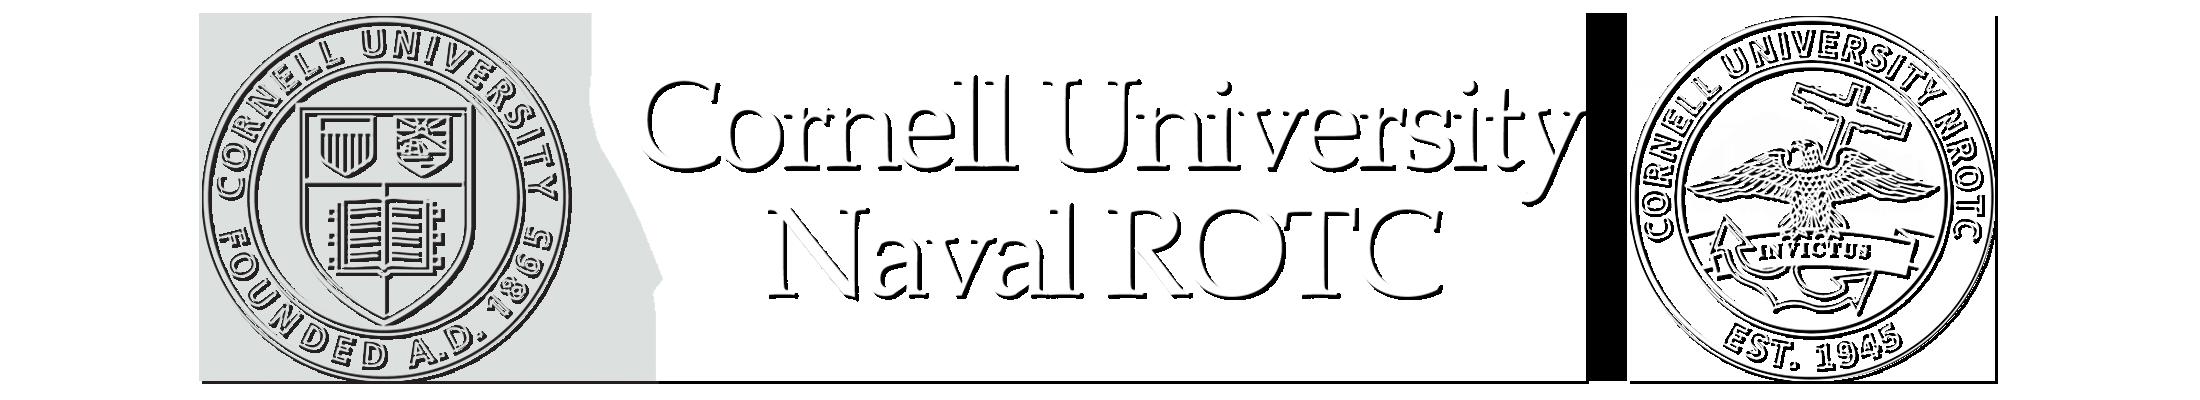 Cornell Naval ROTC